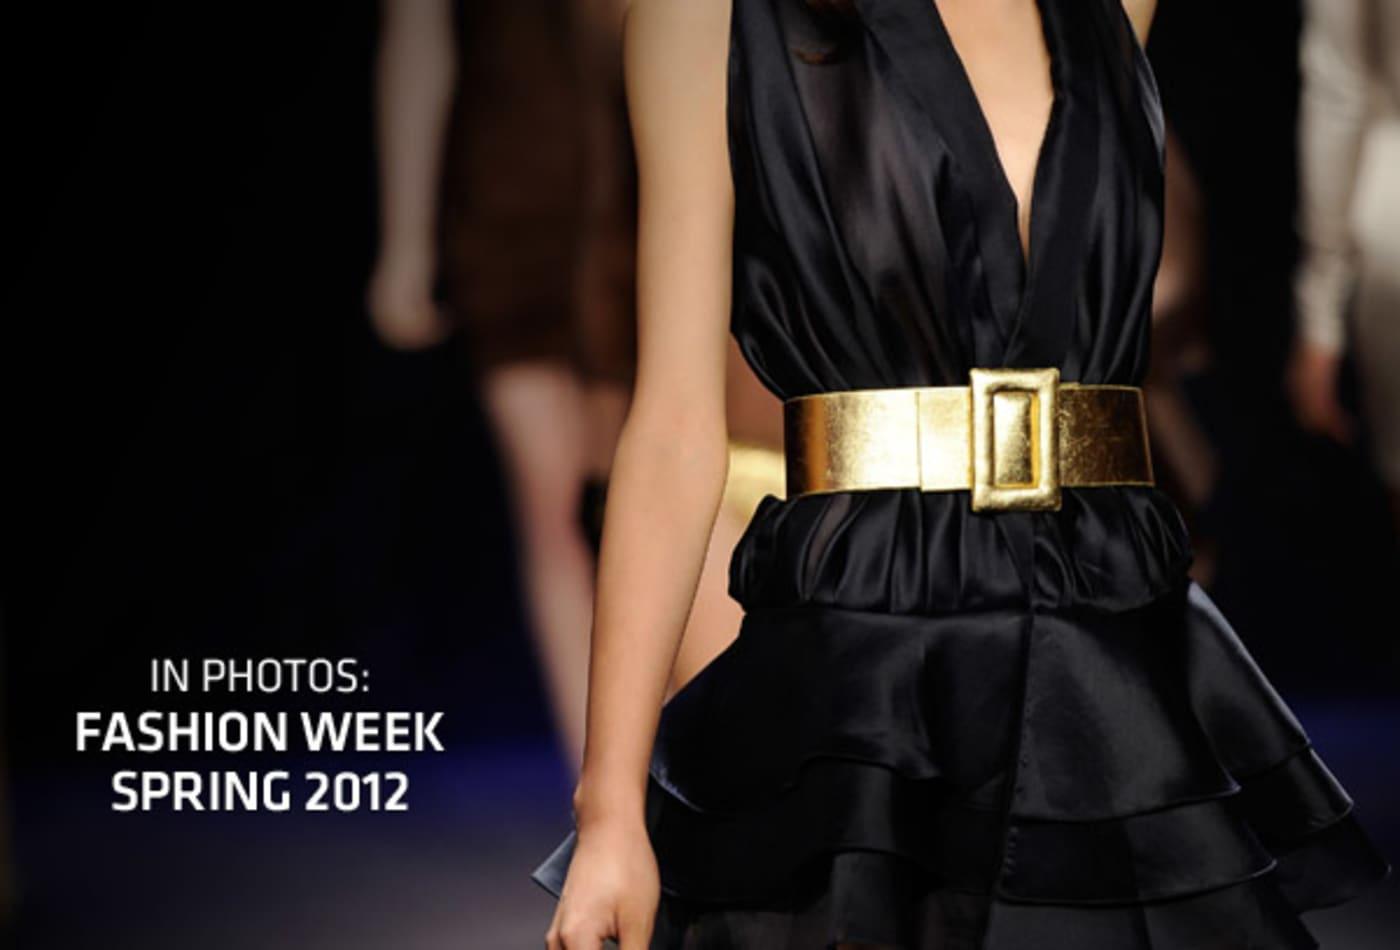 CNBC_NYC_fashion_week_2011_cover2.jpg